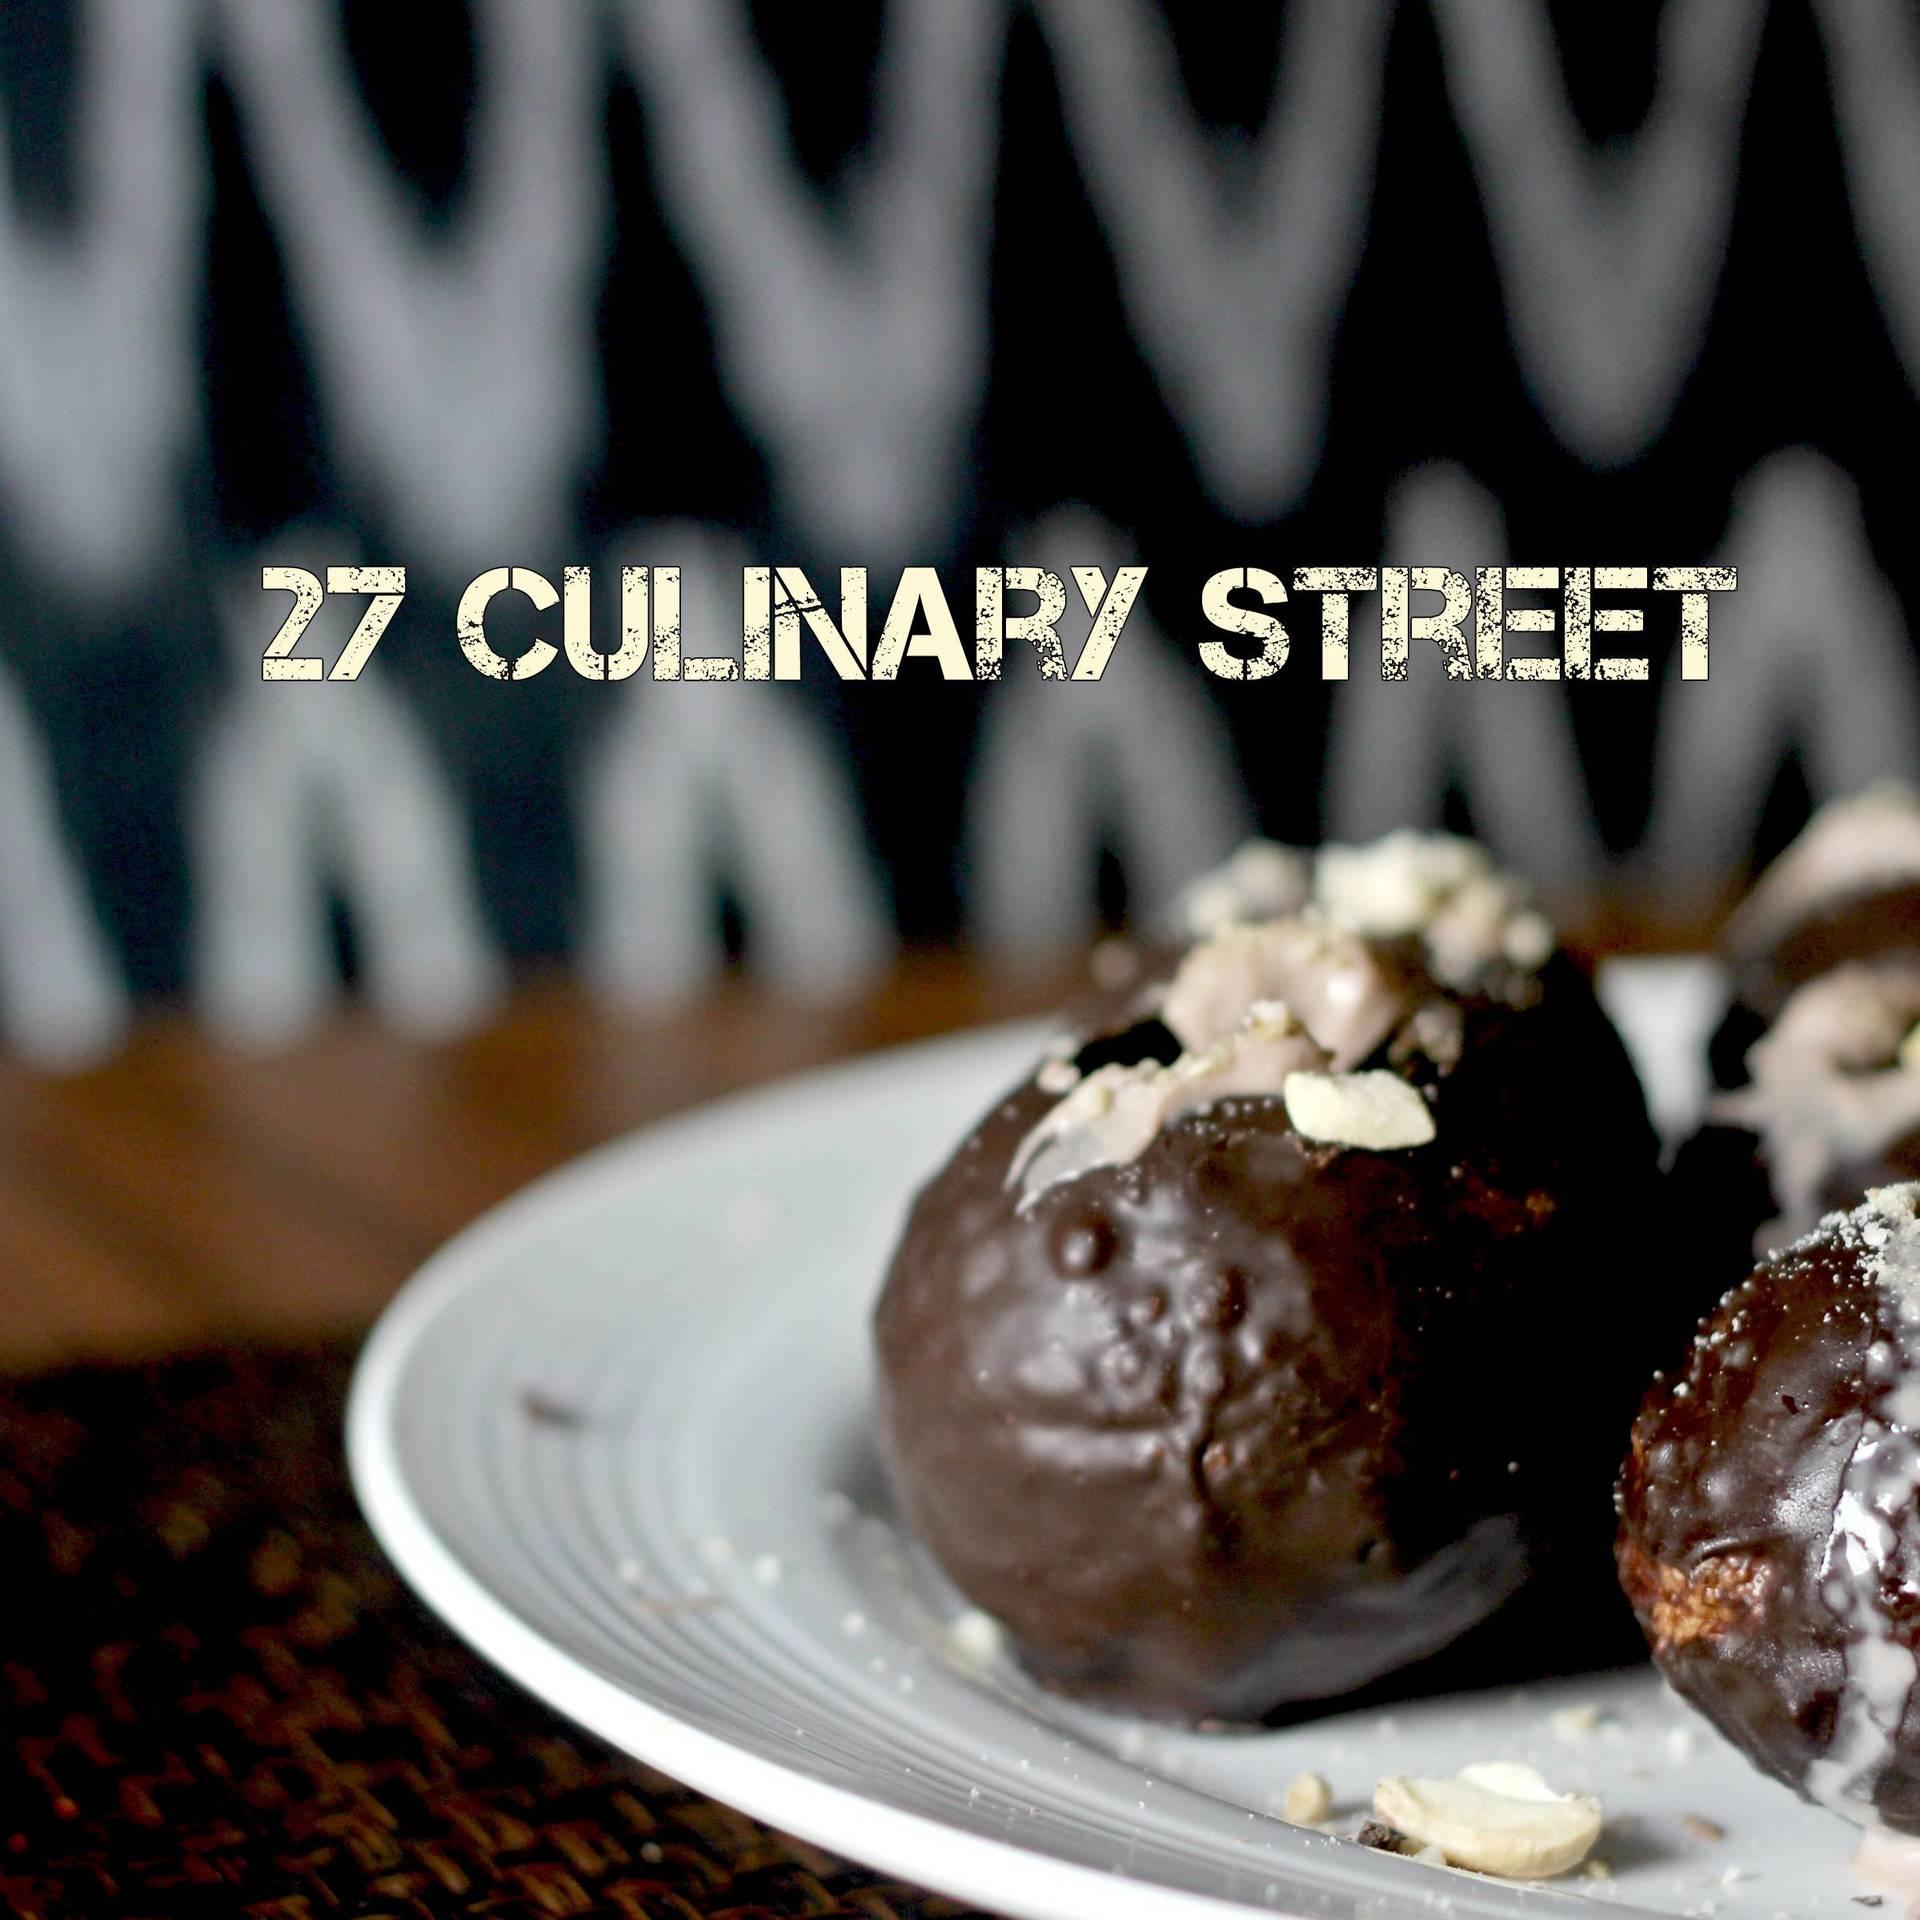 27, Culinary Street, Chennai image